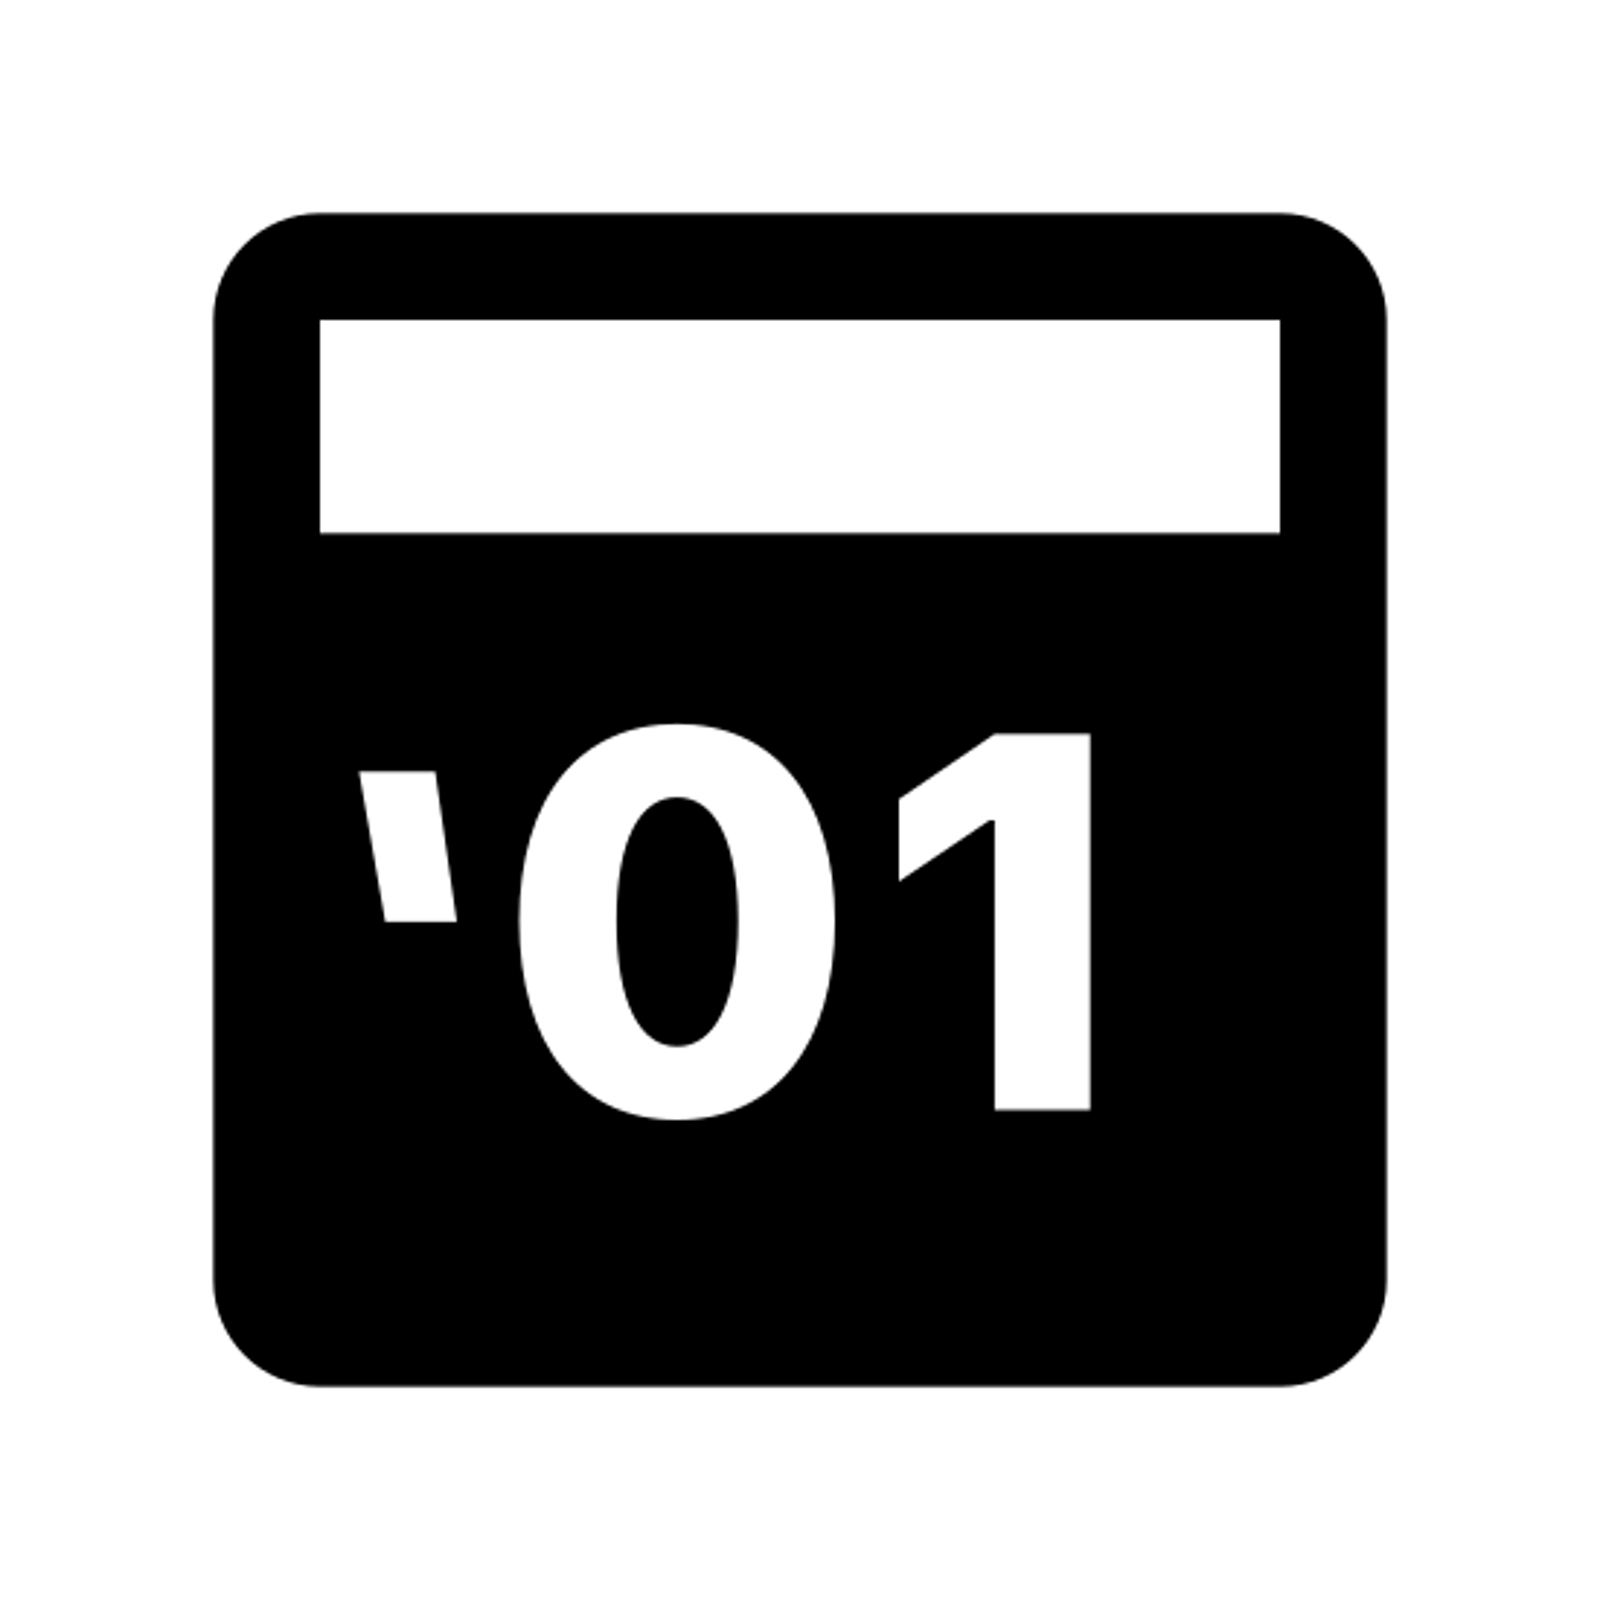 2001 icon